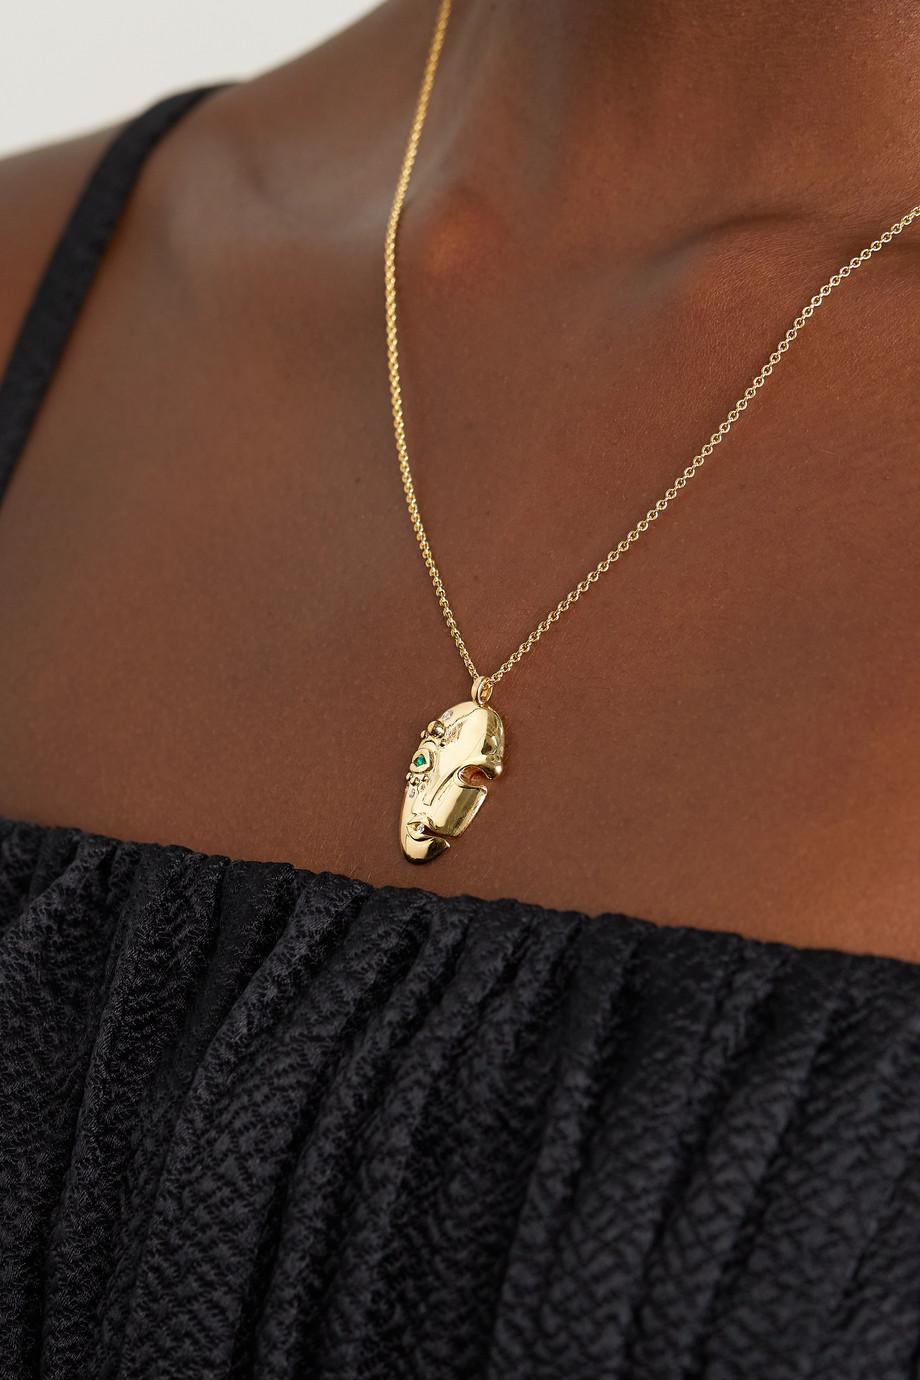 KHIRY Fine Mask 18-karat gold, diamond and emerald necklace